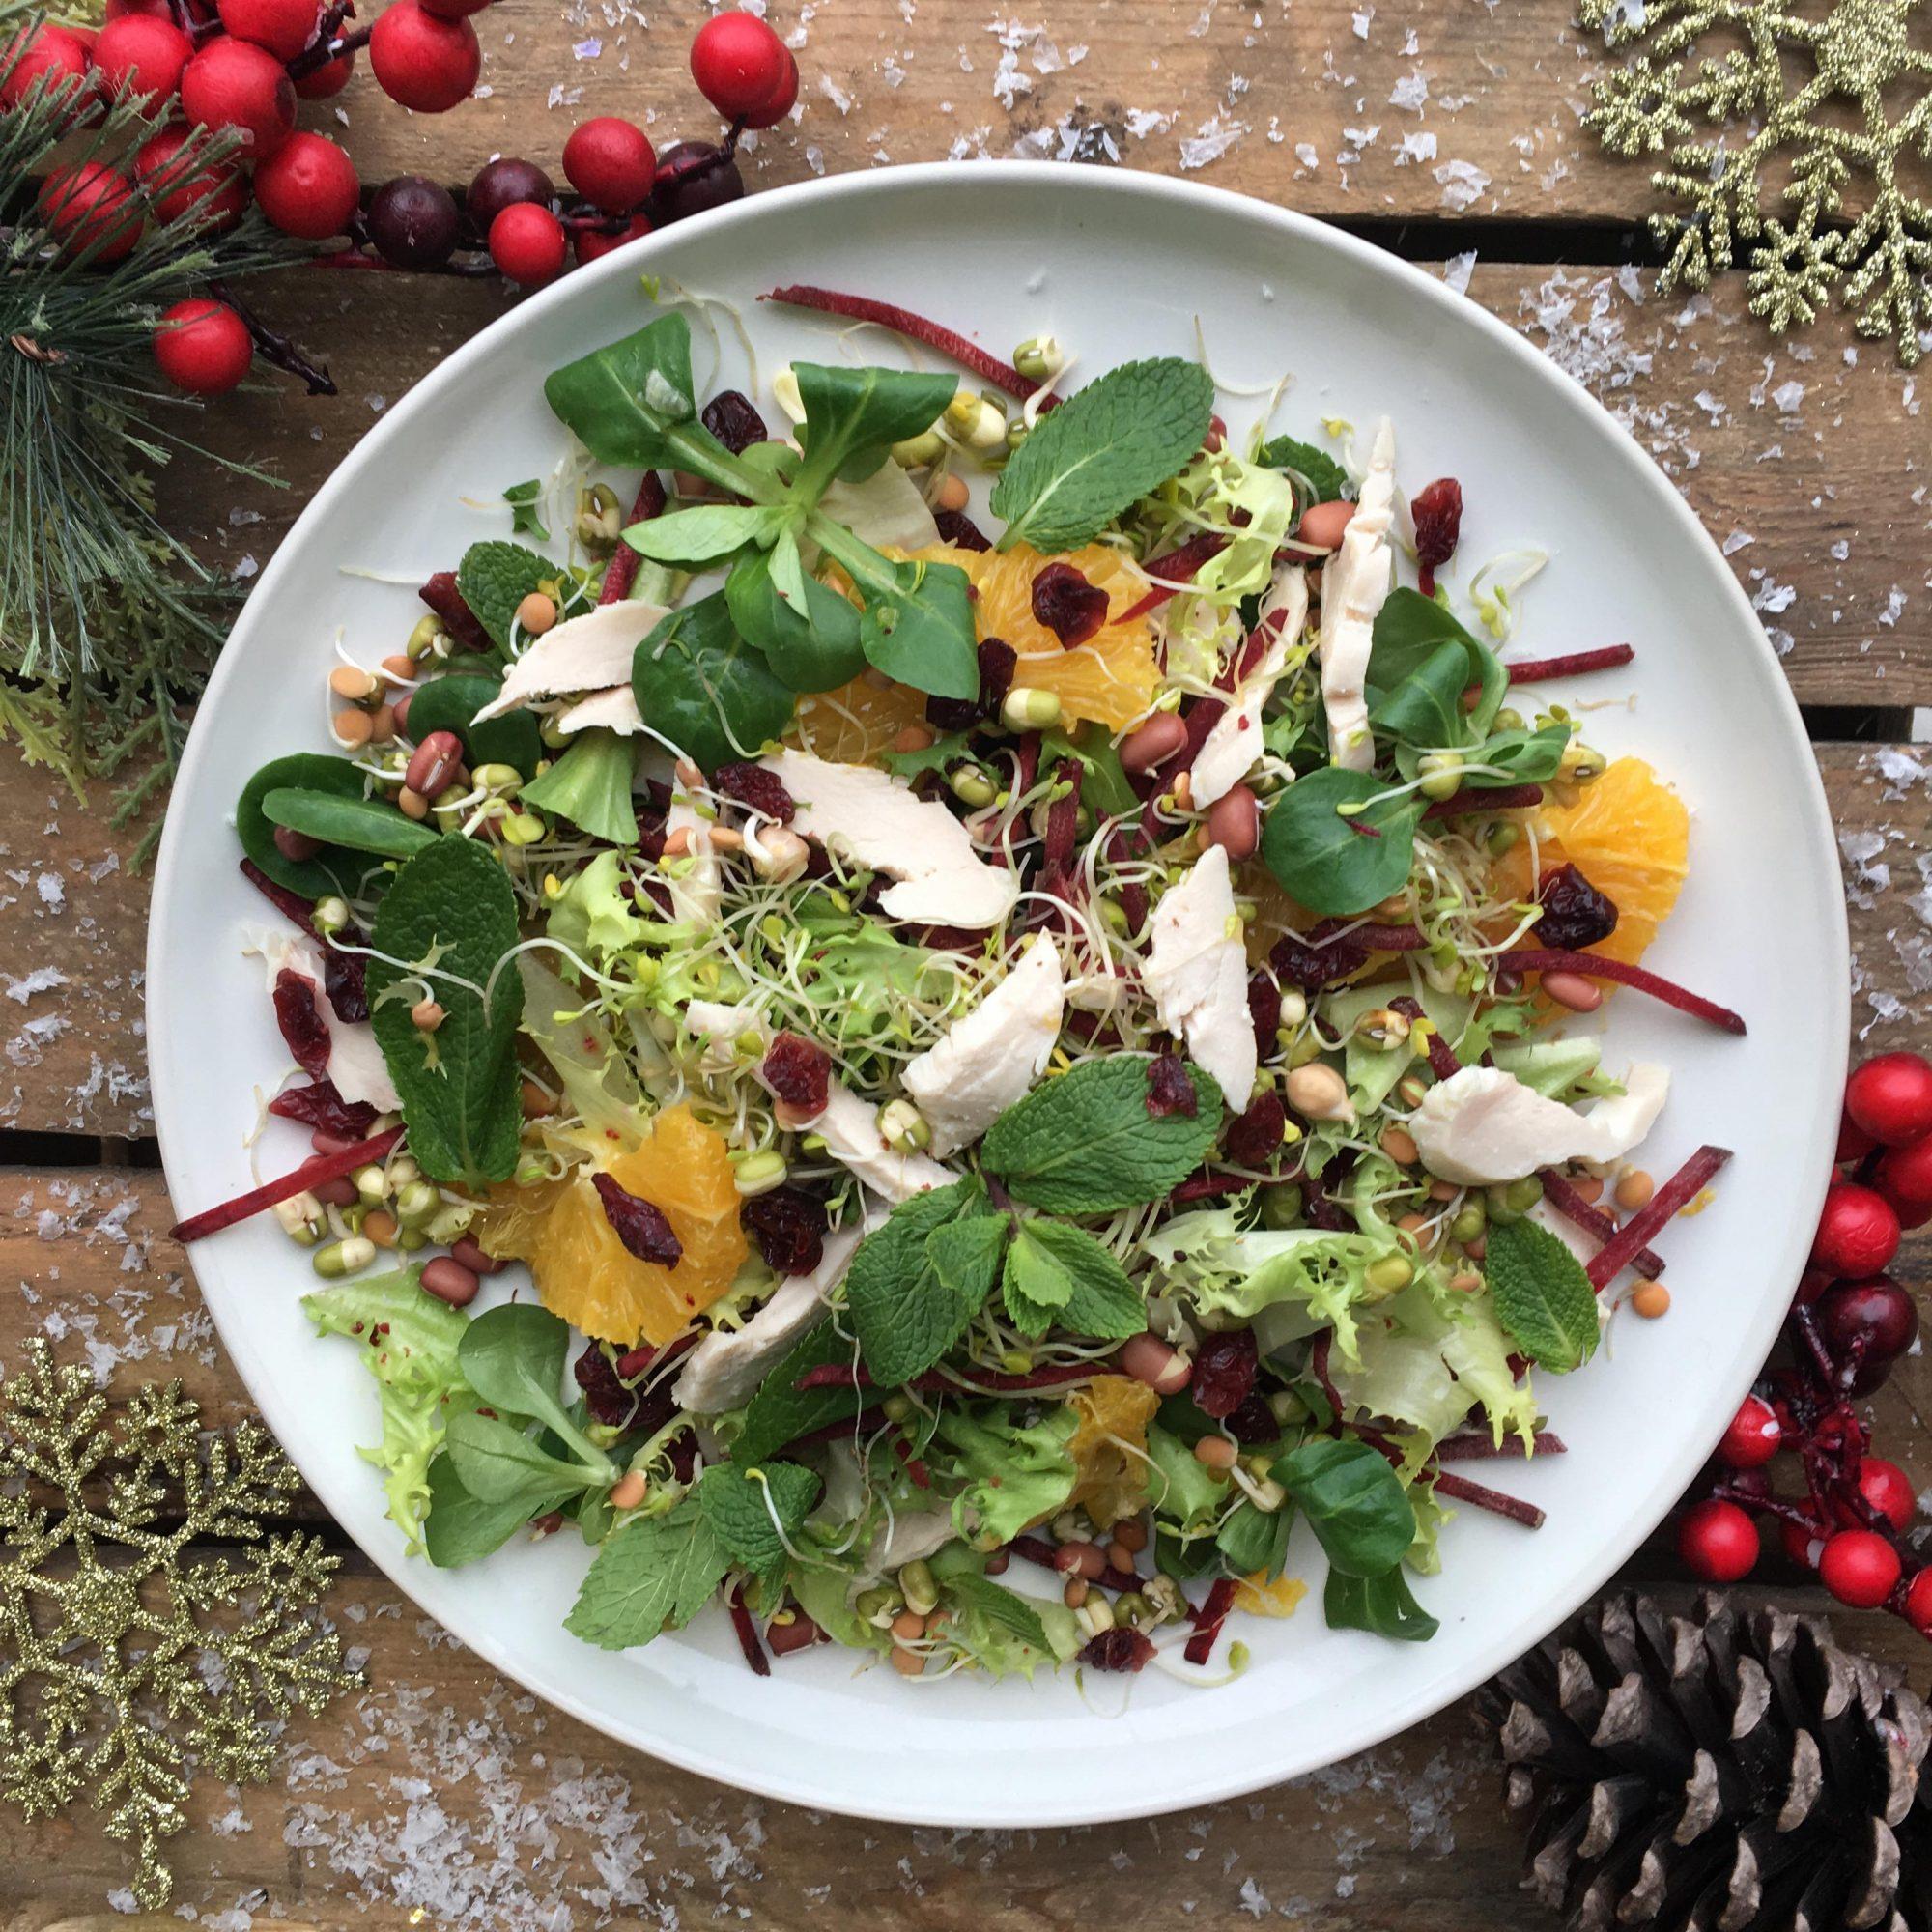 Turkey & Cranberry Salad